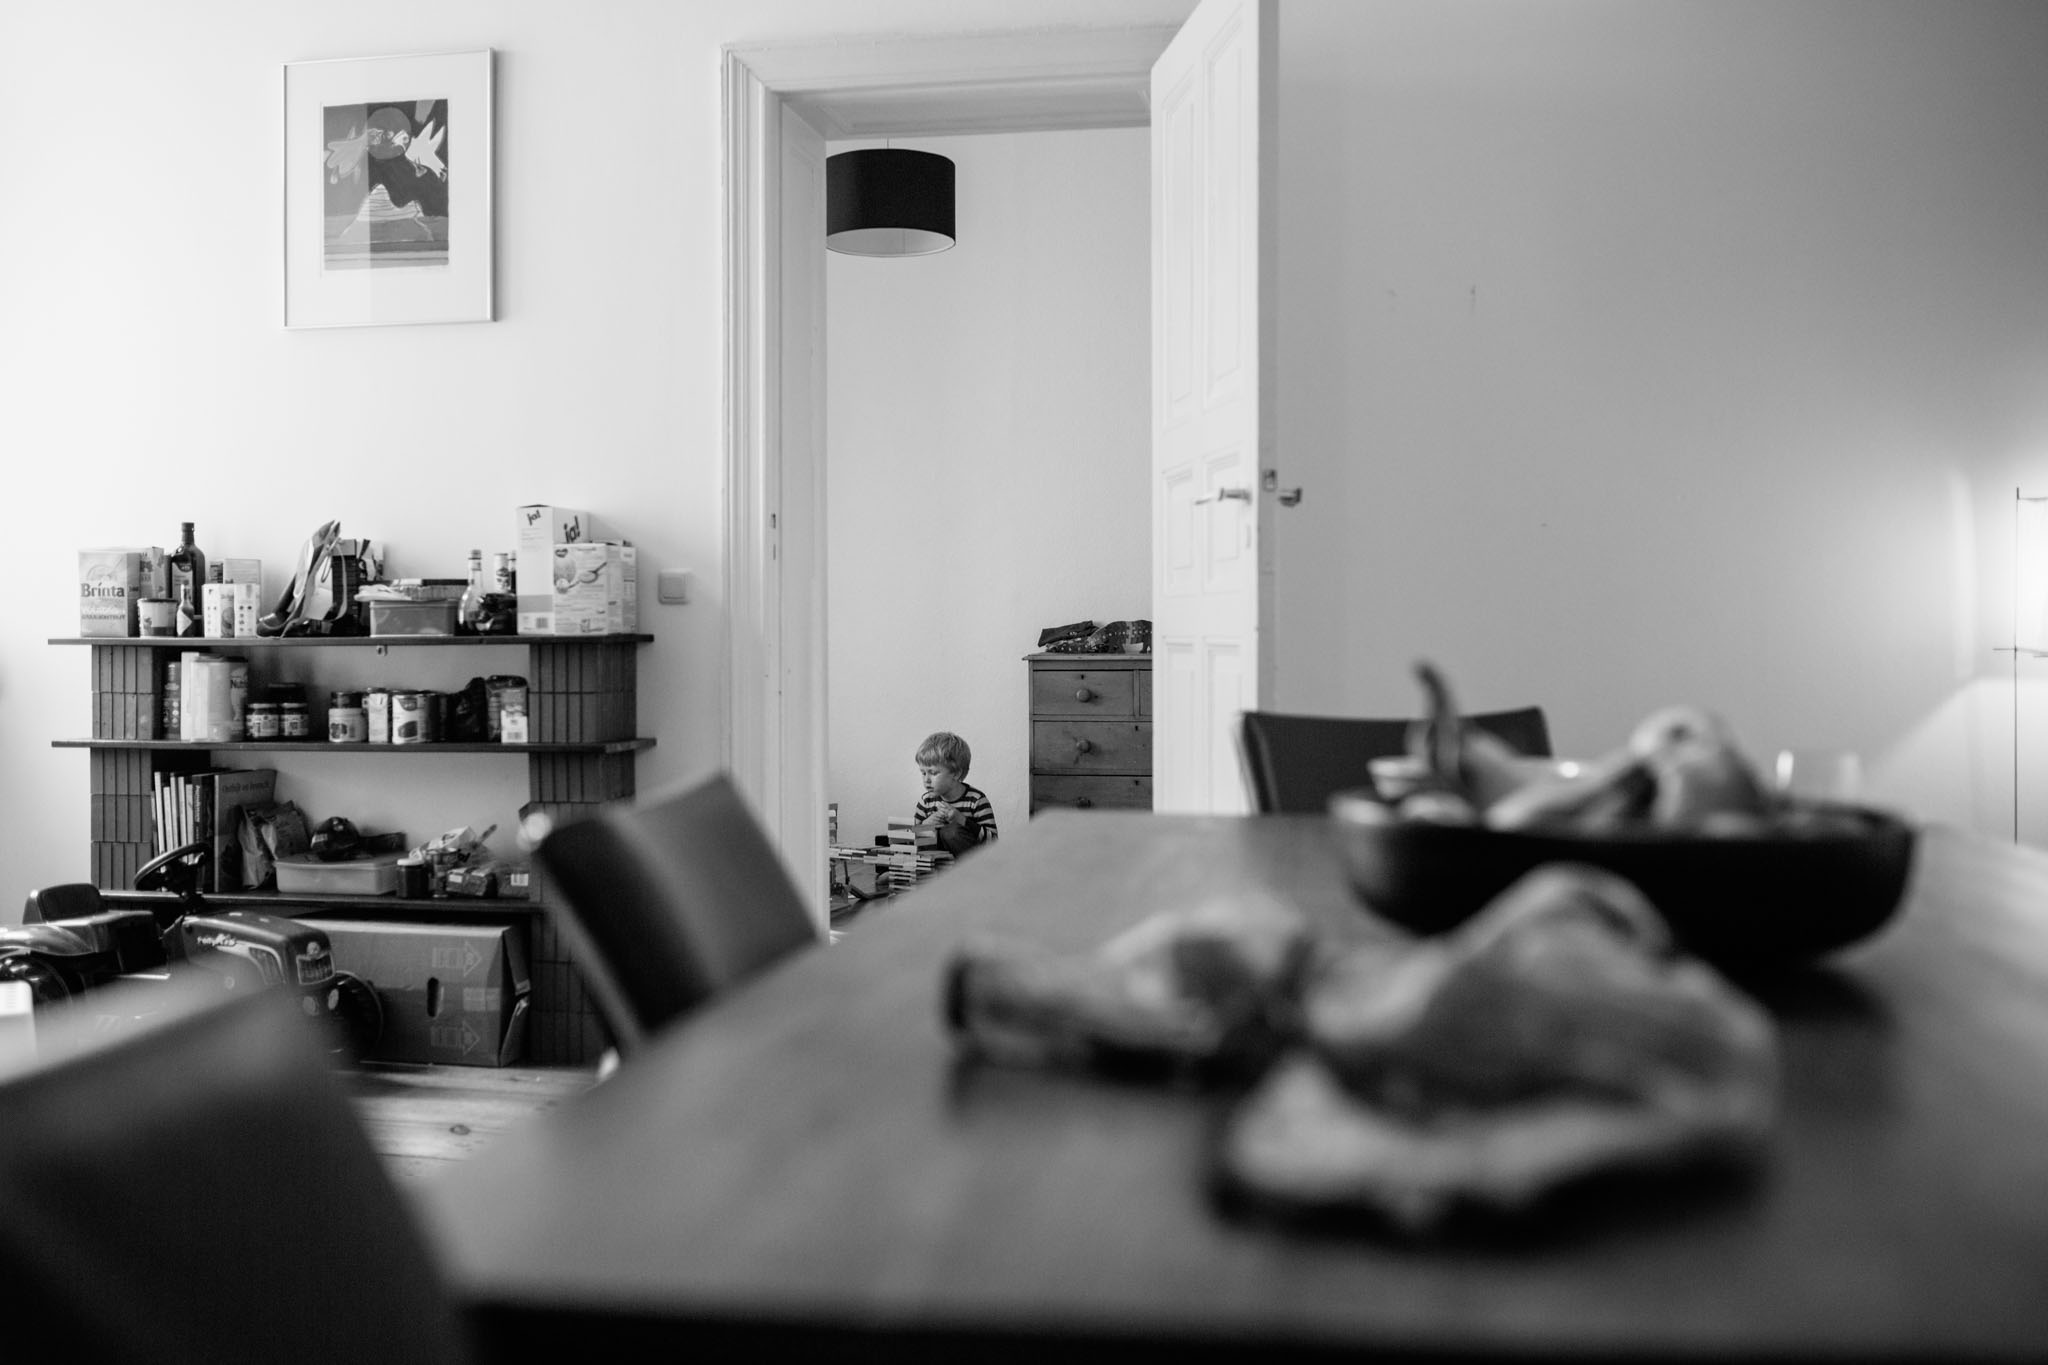 familienfotos-schwarzweiss-reportage-kreuzberg